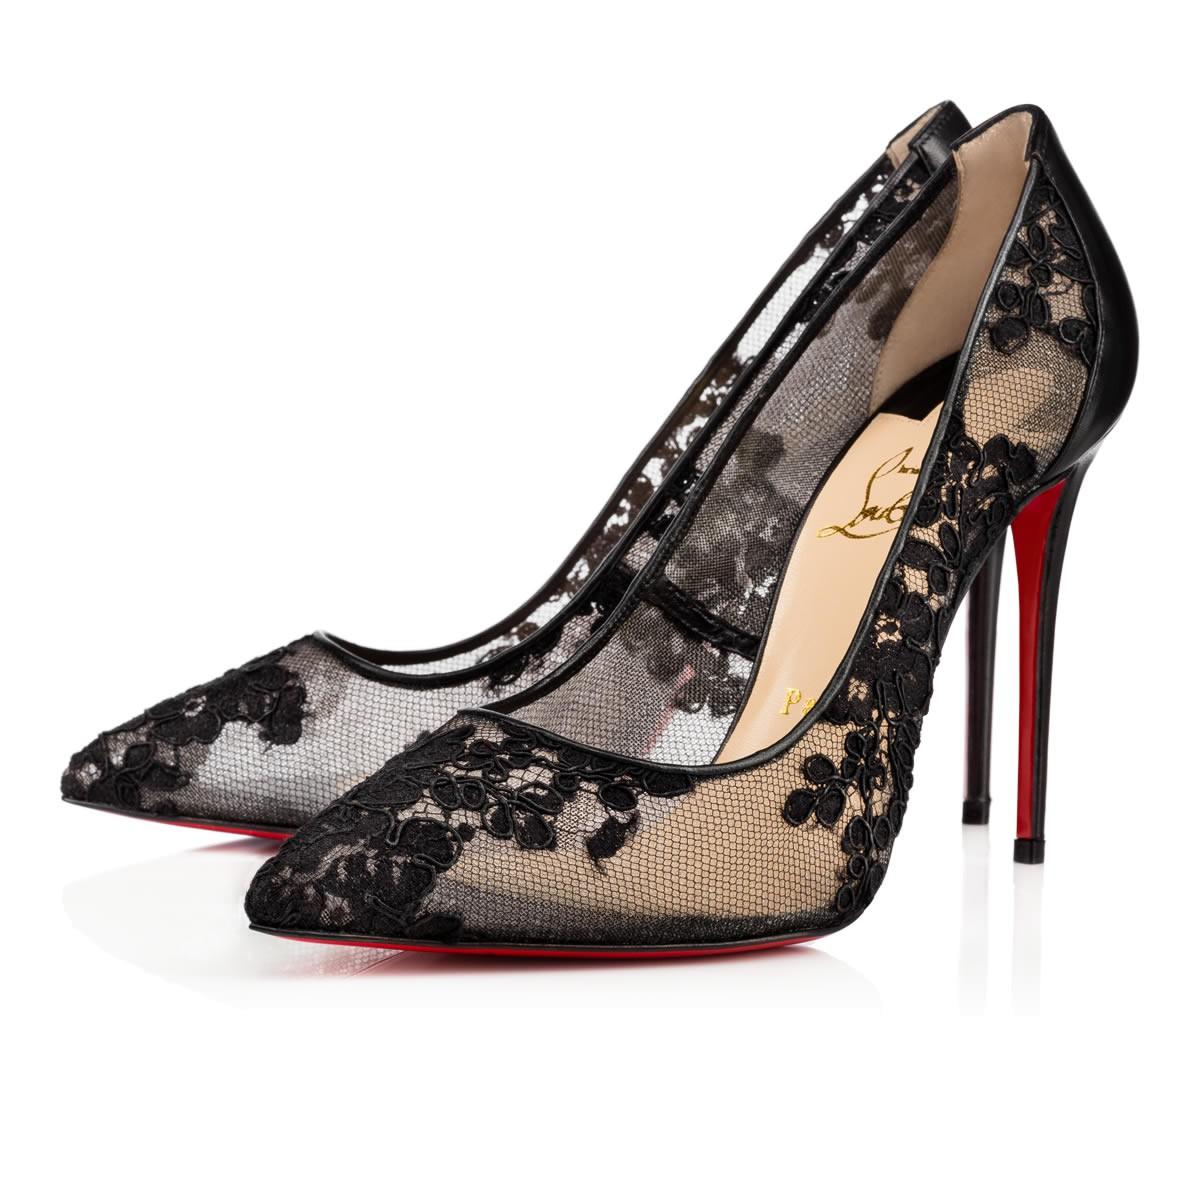 Lace Louboutin Shoes